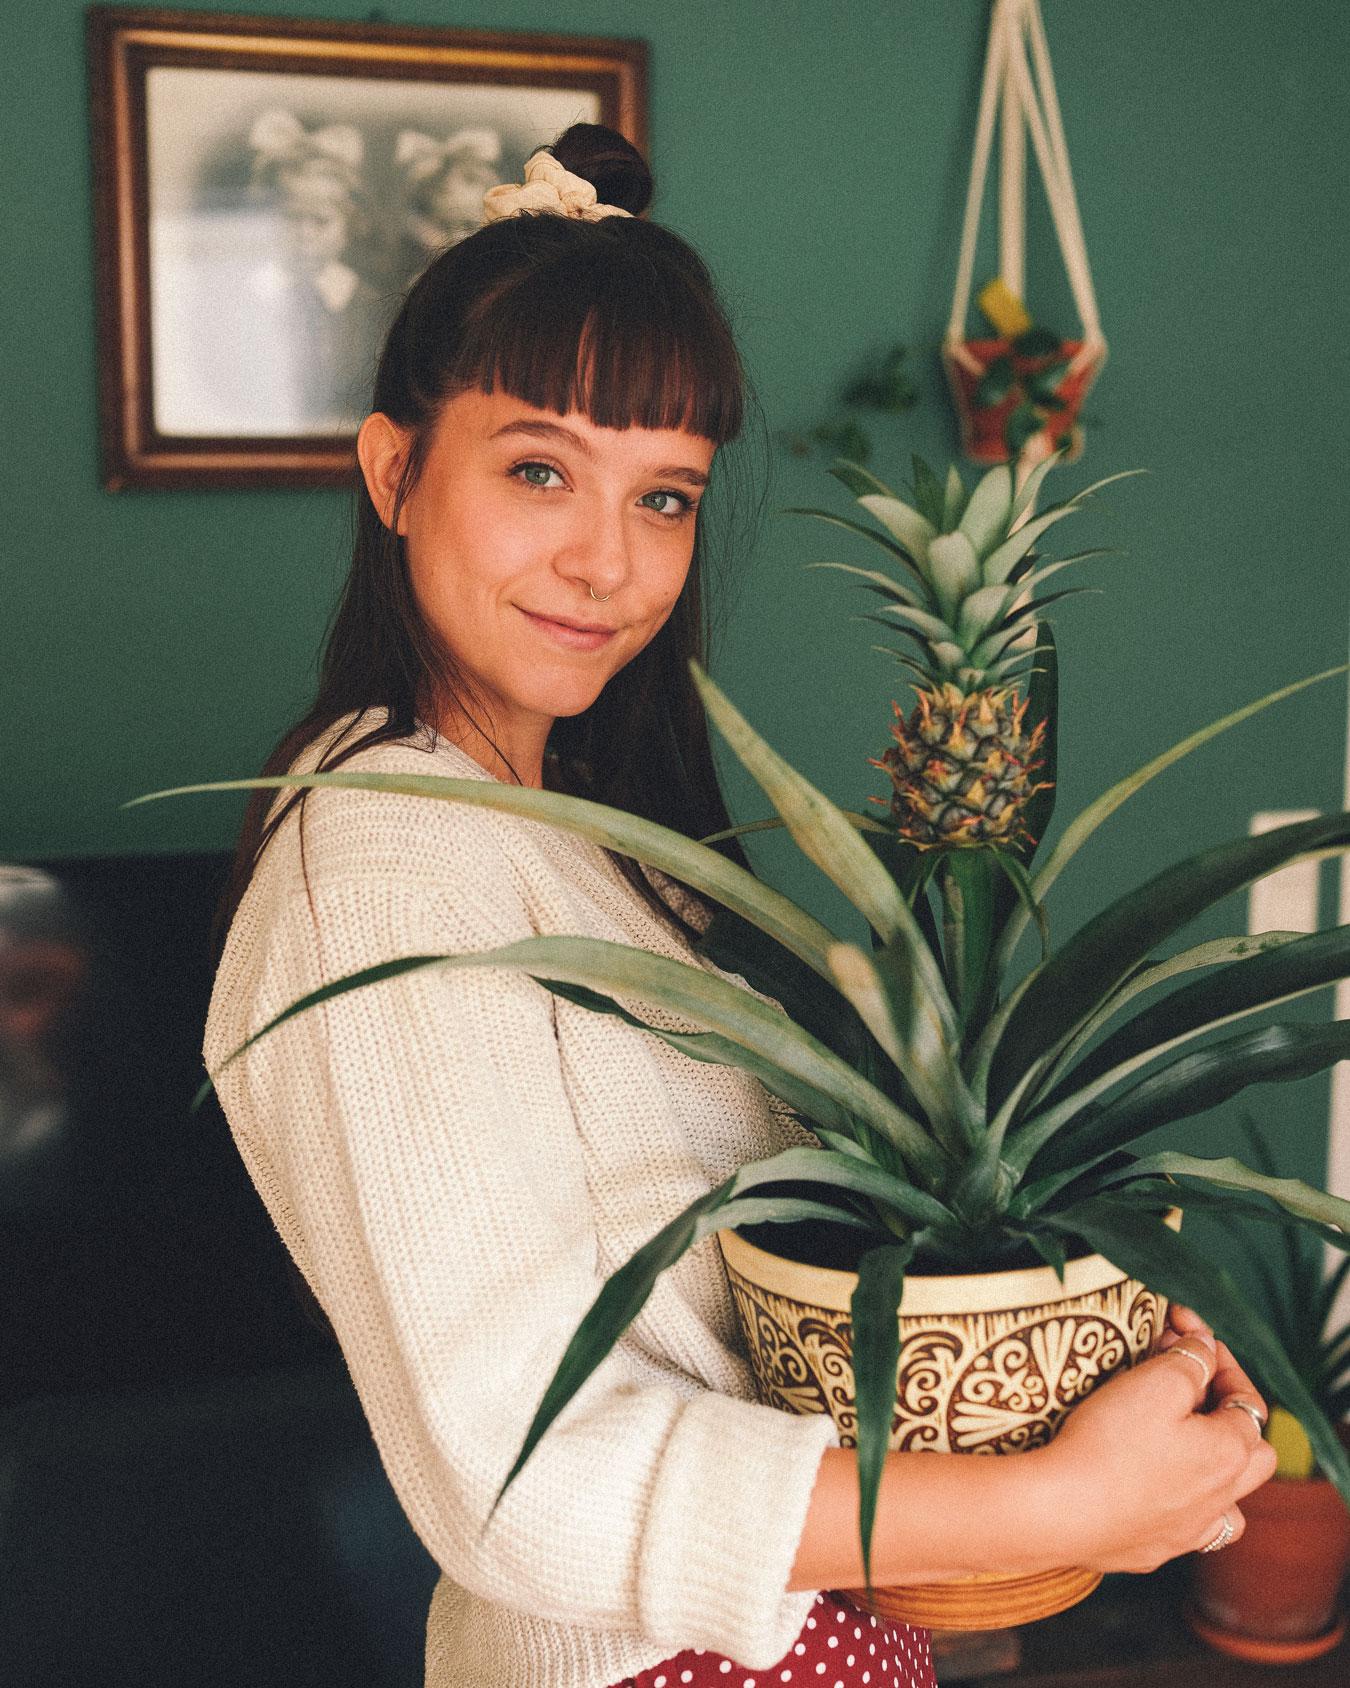 Frau trägt Pflanze Bromelien Junestorm